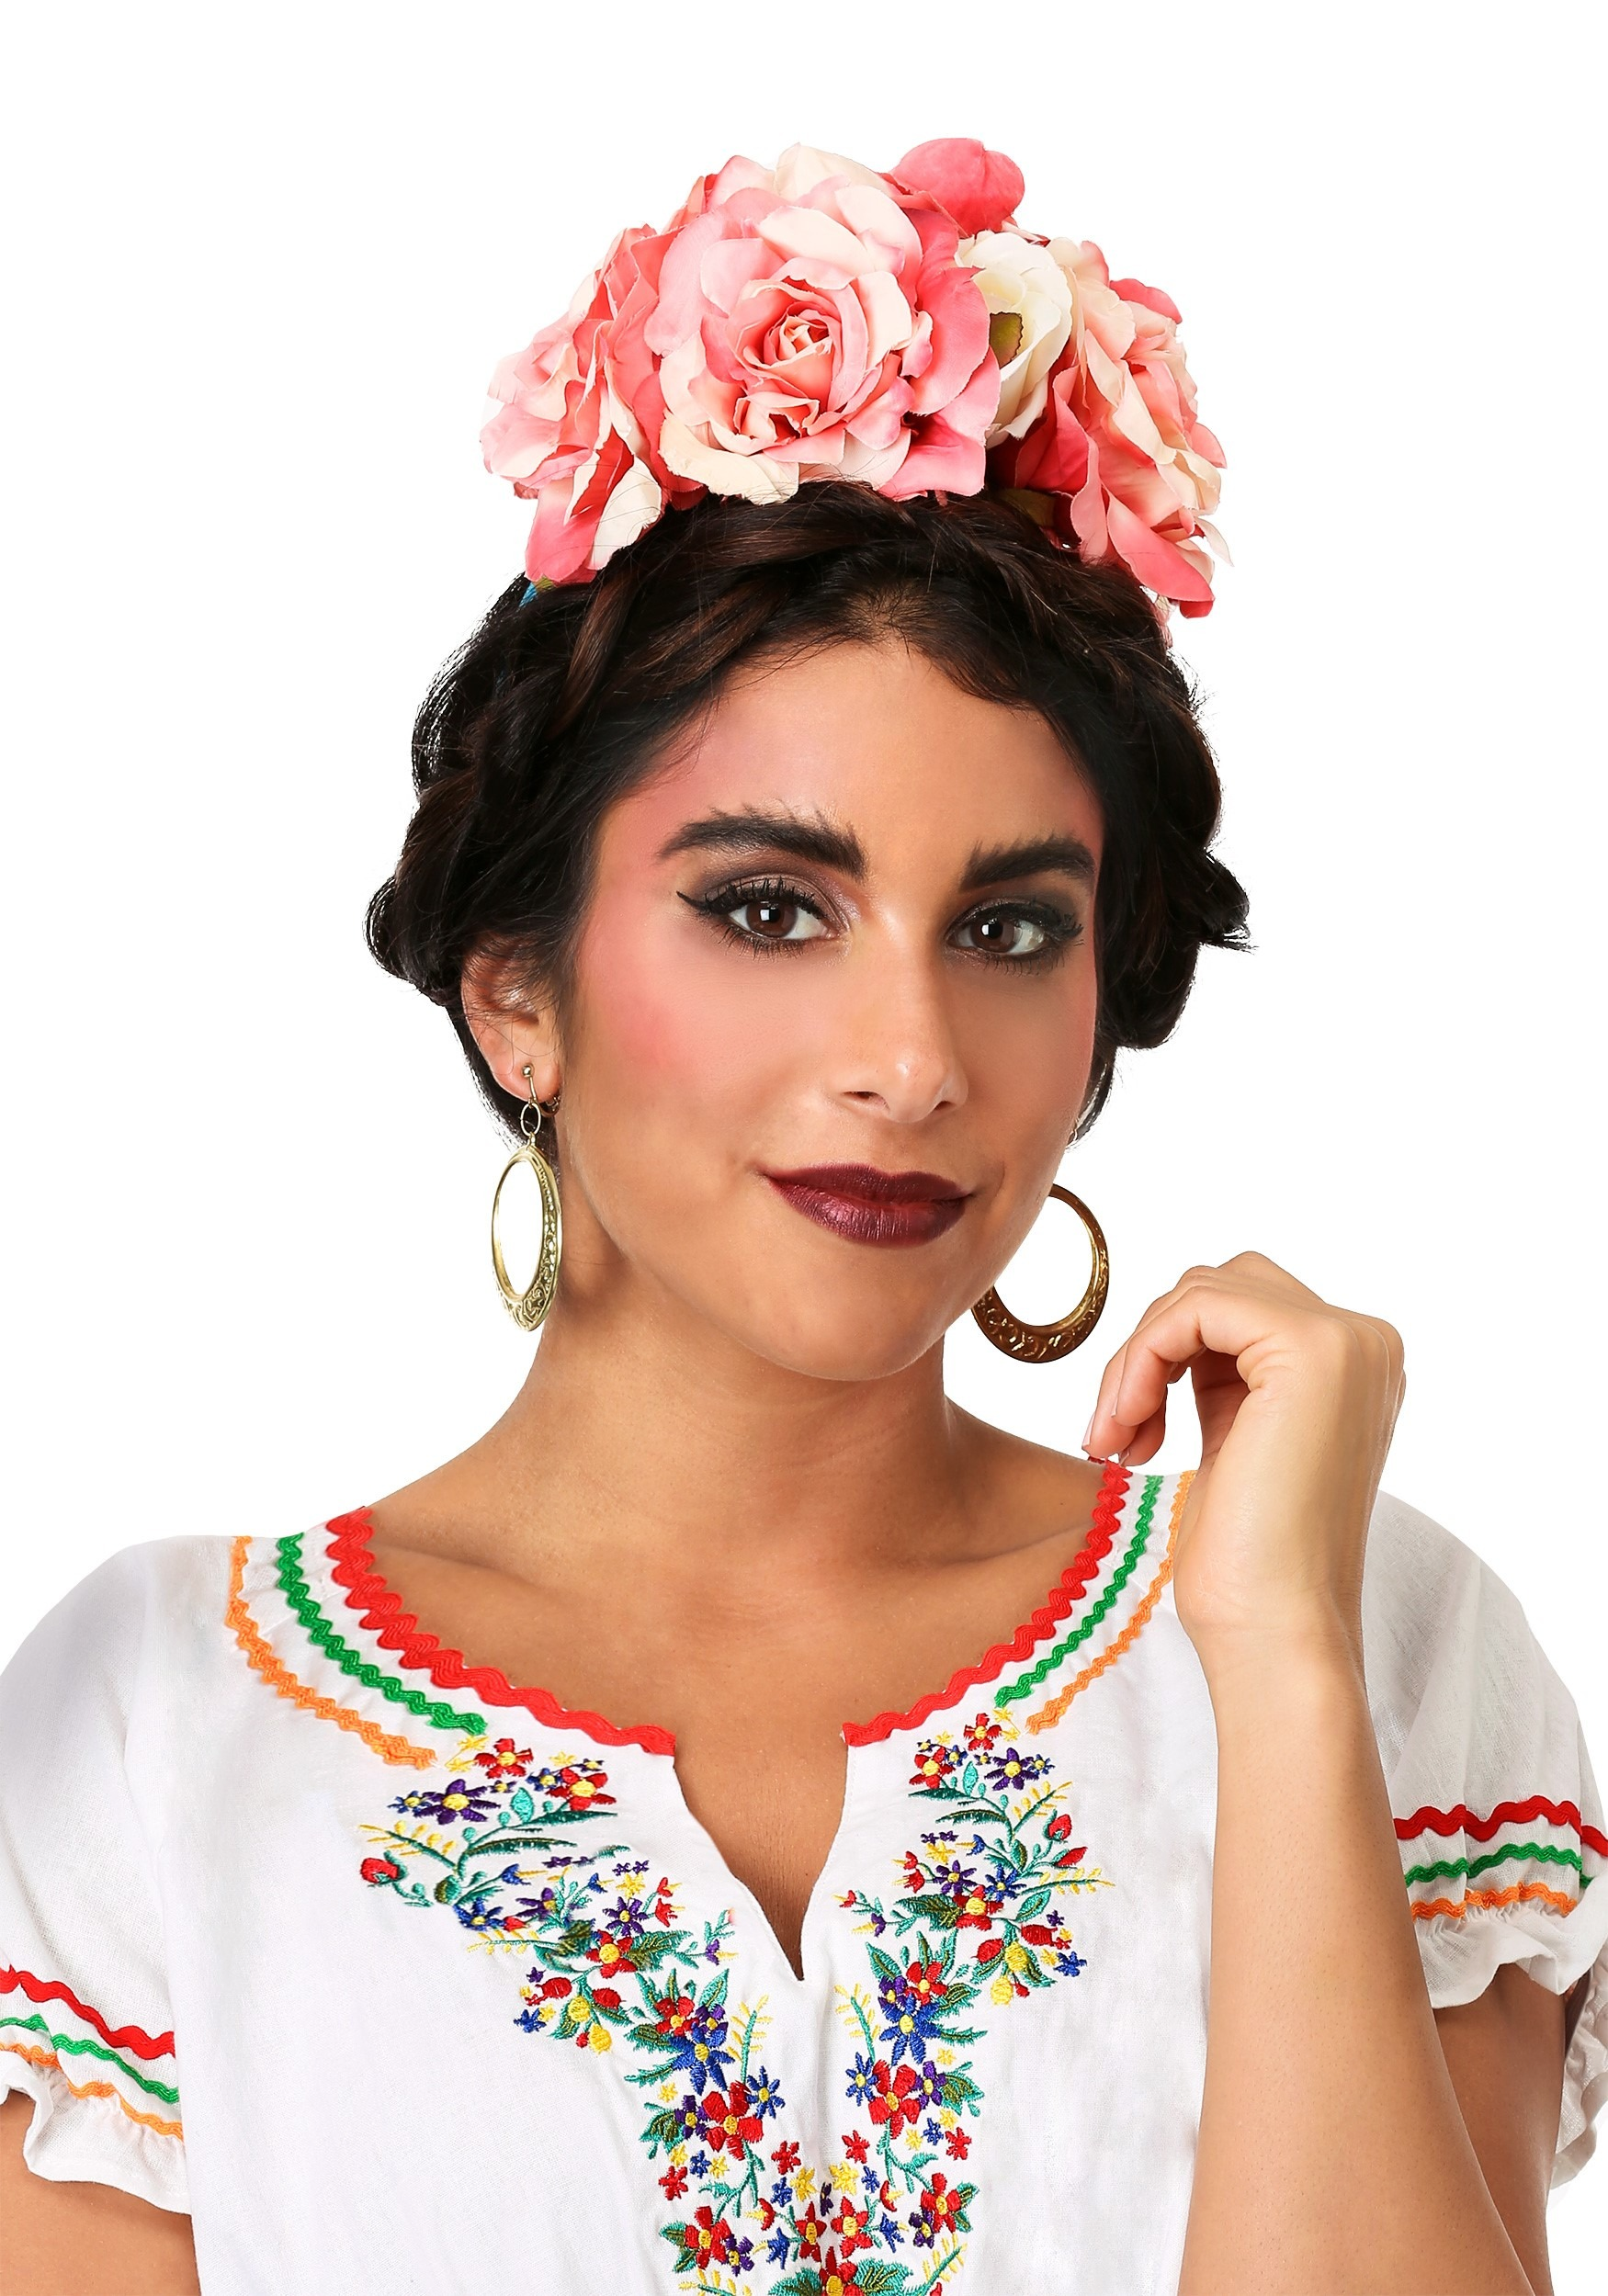 Floral Frida Kahlo Headband